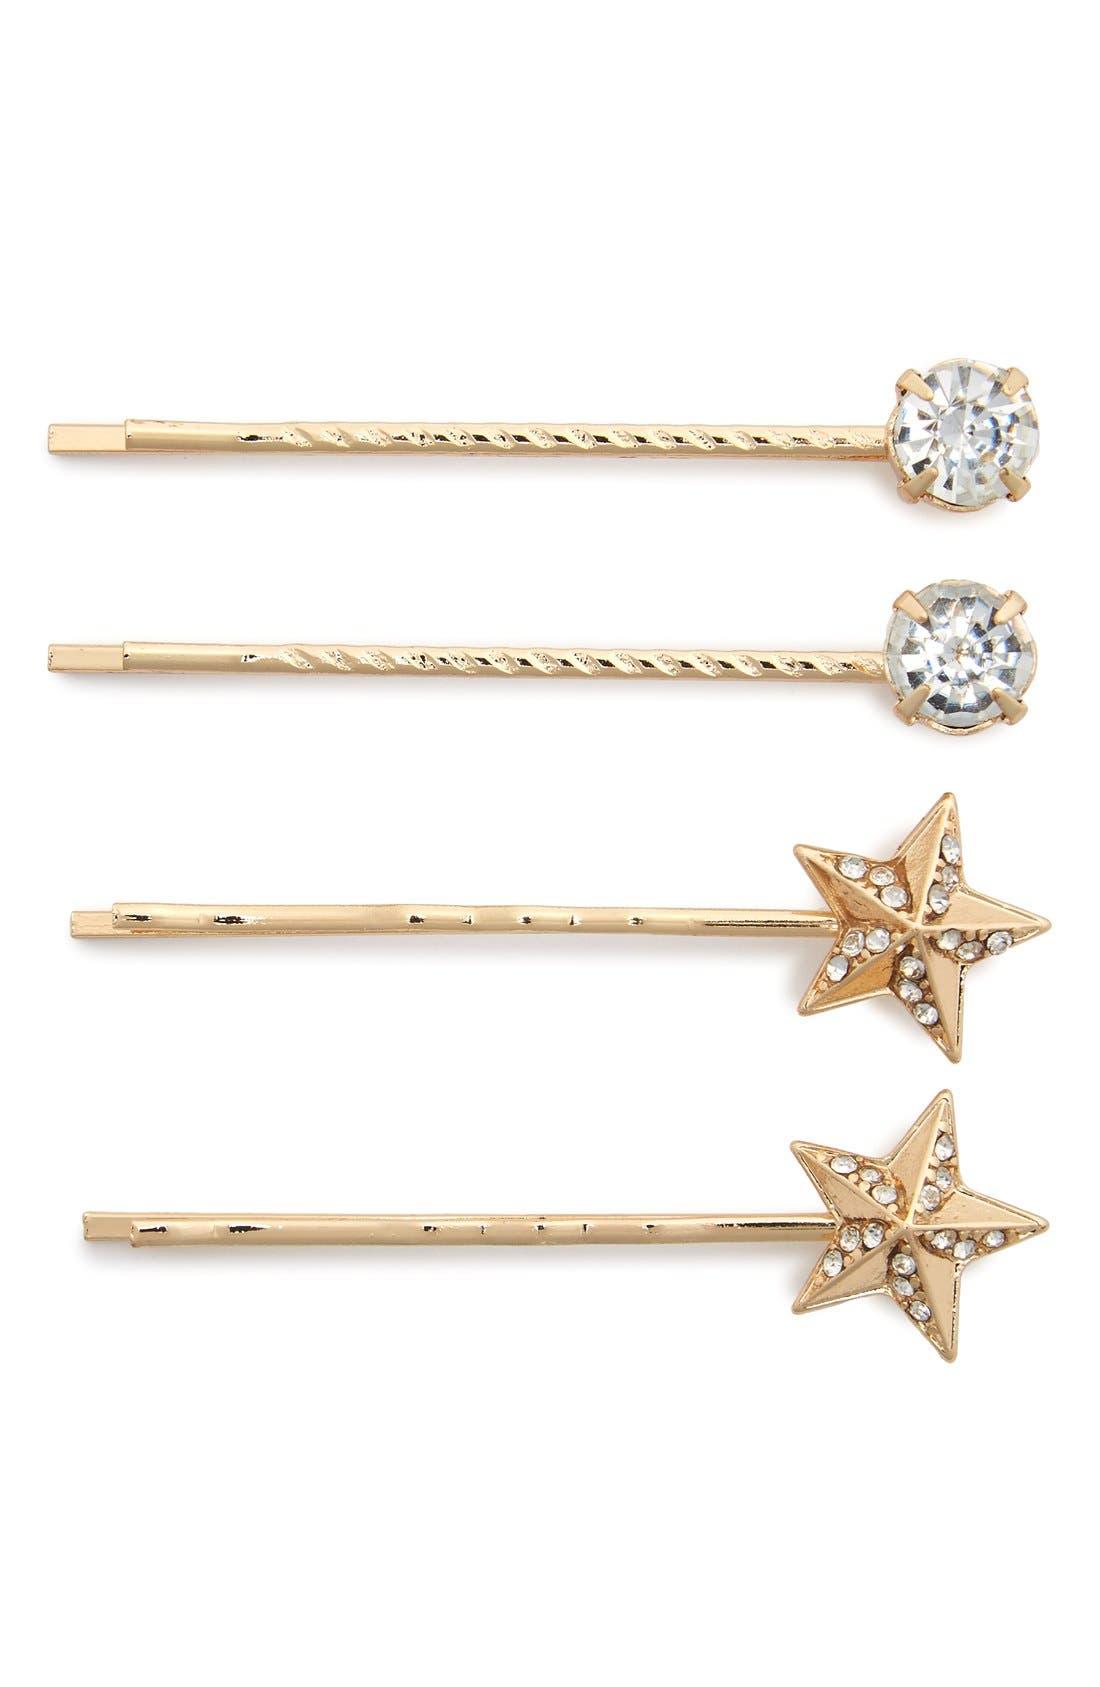 Alternate Image 1 Selected - Tasha 'Shooting Star' Bobby Pins (4-Pack)